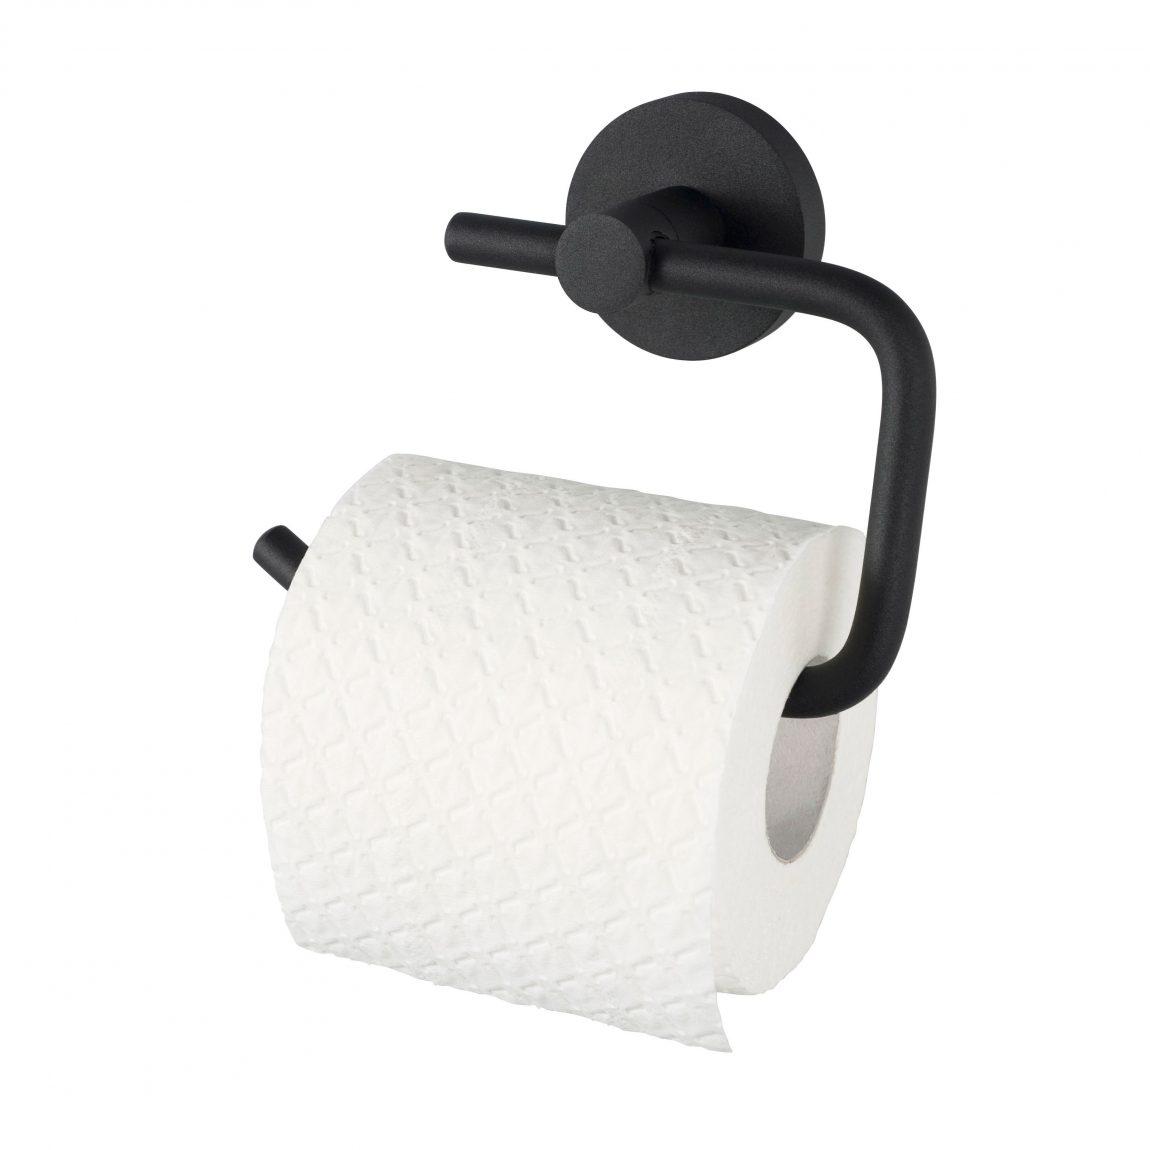 zwarte-haceka-kosmos-toiletrolhouder